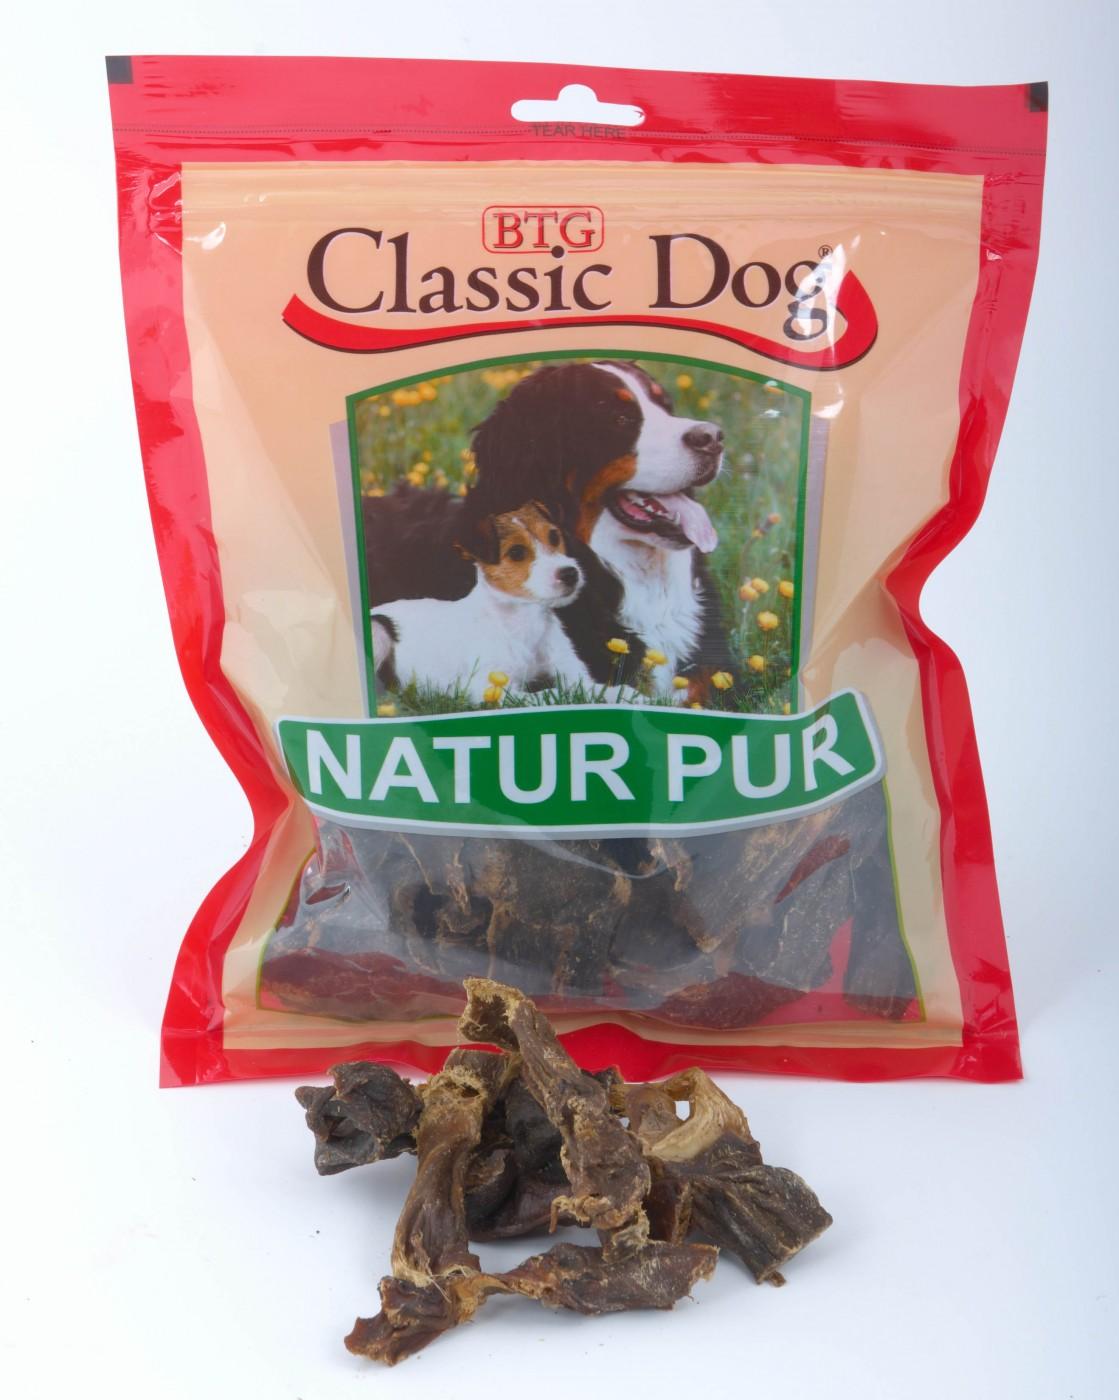 Classic Dog Rinderherzen | 100g Hundesnack